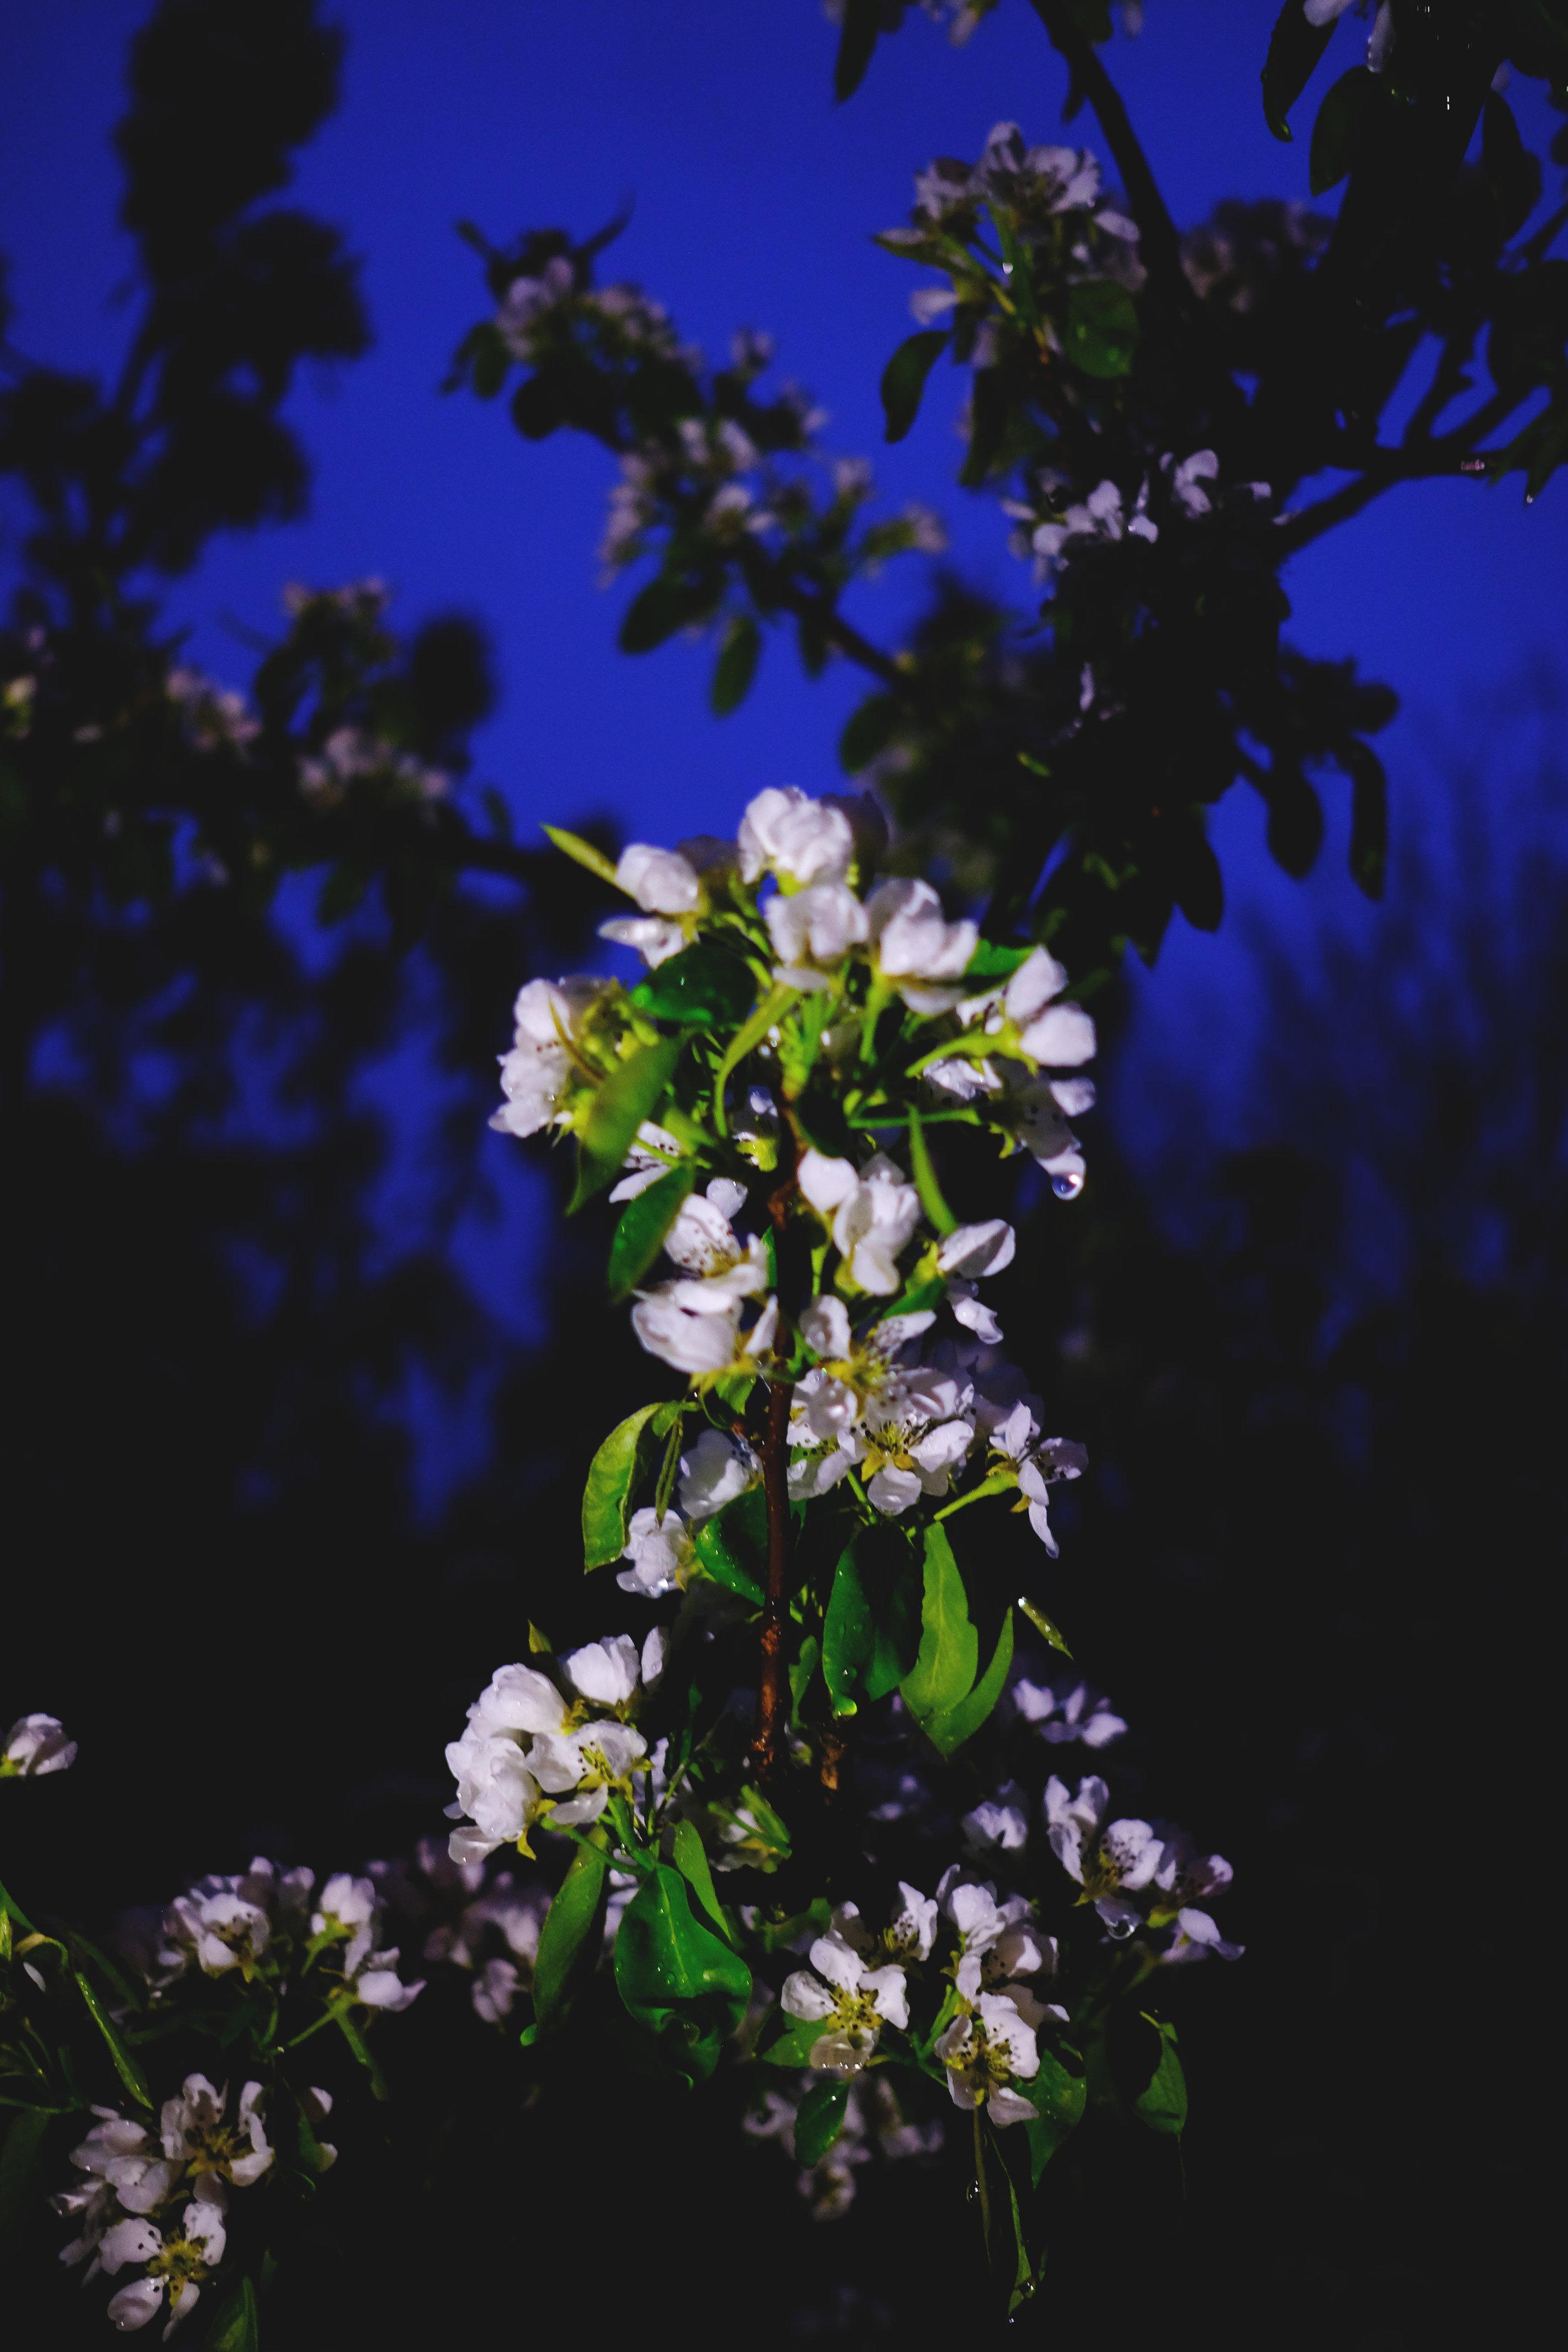 flowers_night.jpg